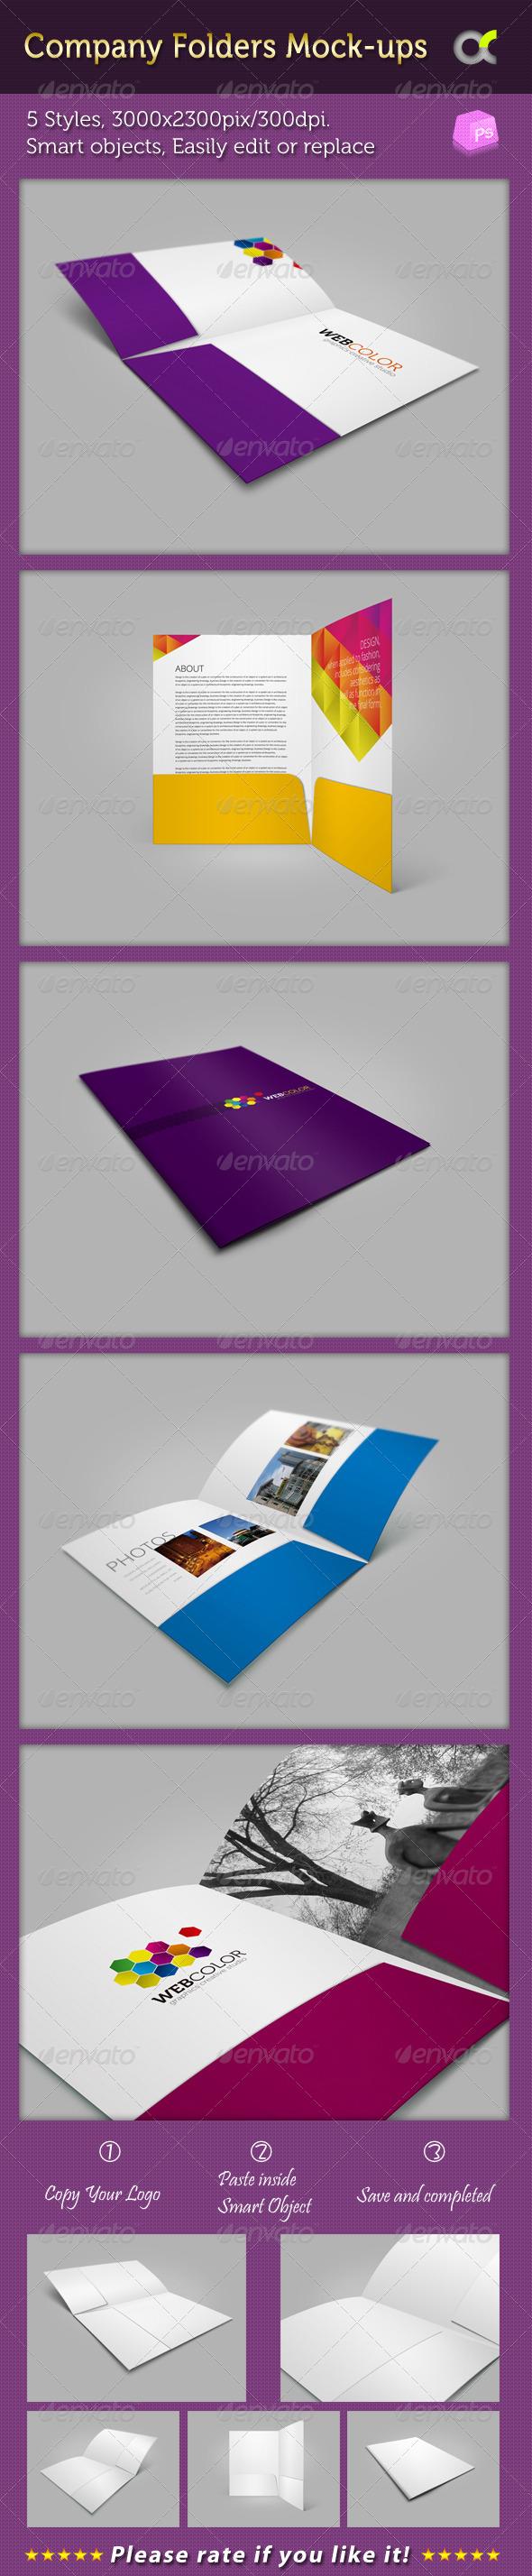 GraphicRiver Company Folders Mock-ups 5361642